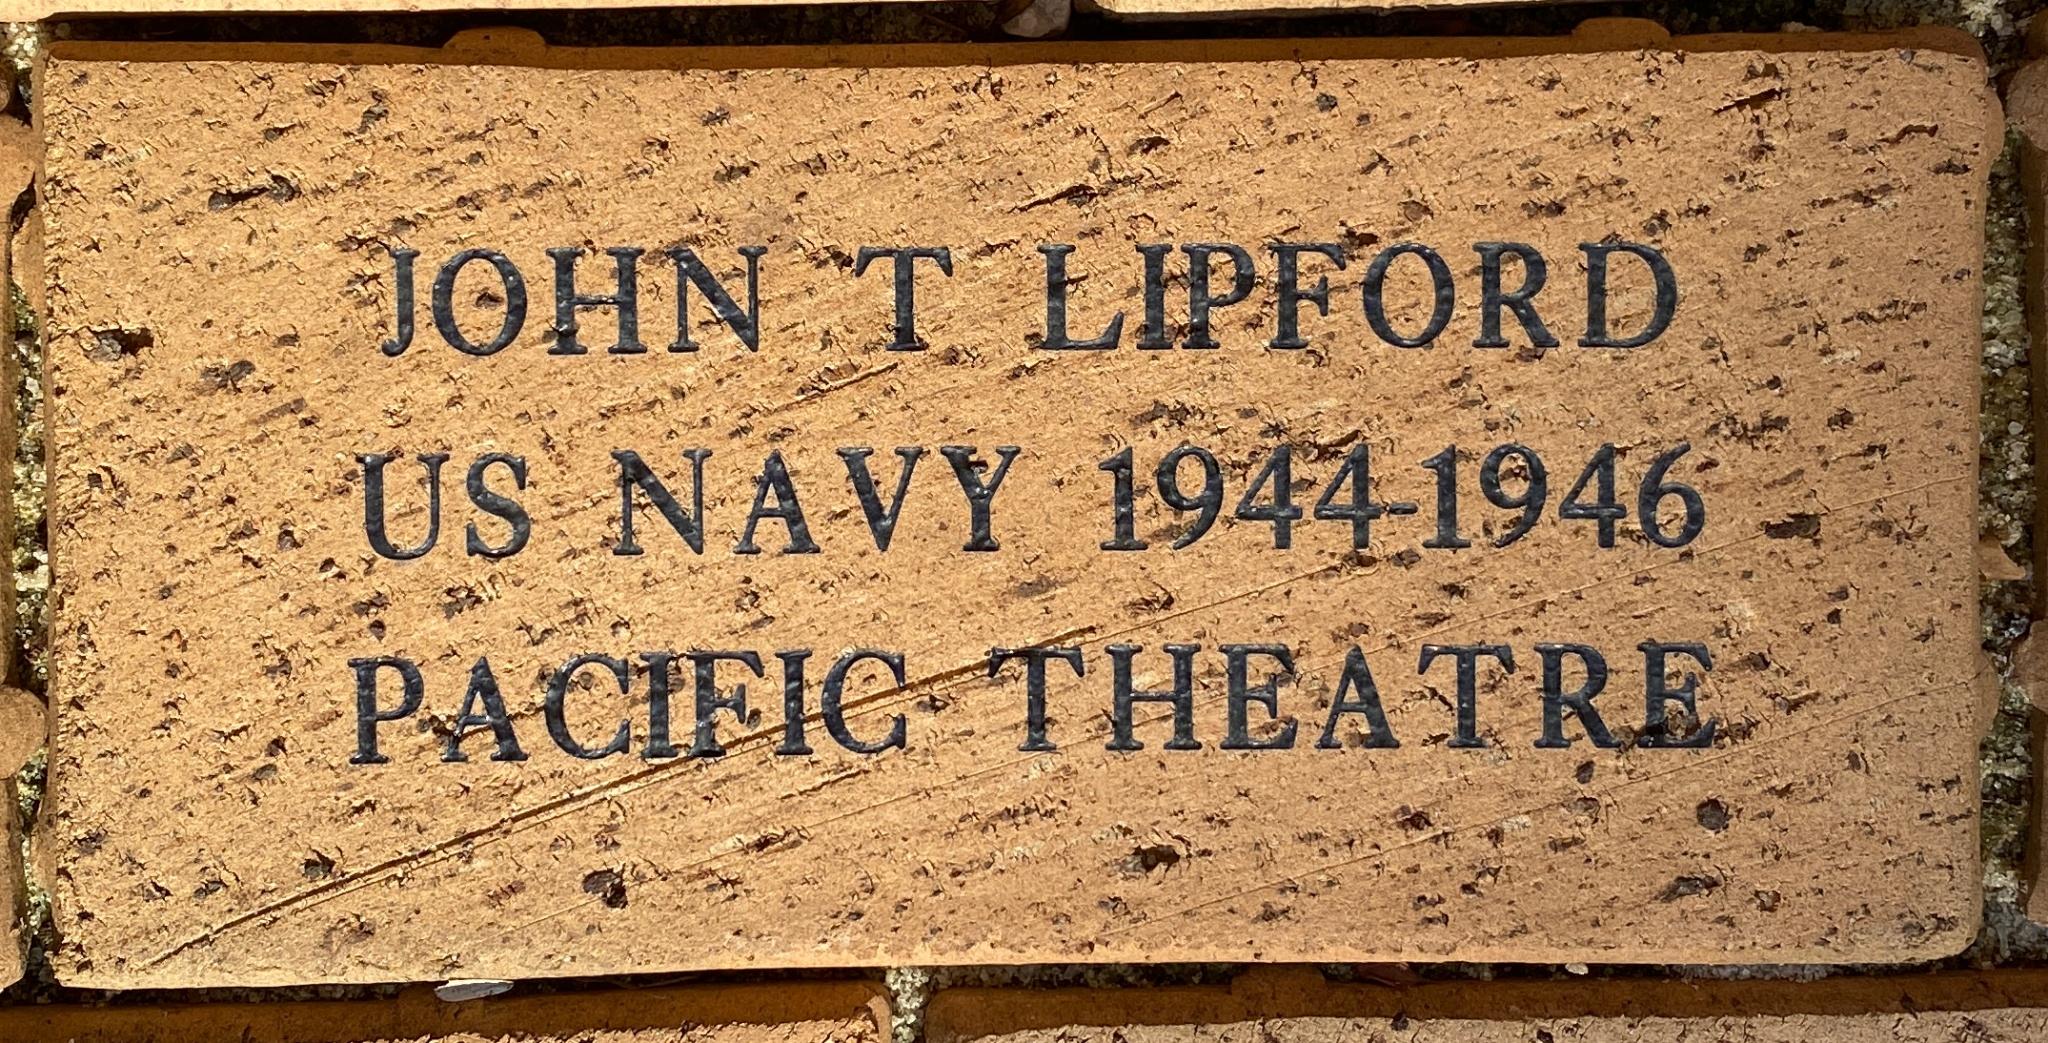 JOHN T LIPFORD US NAVY 1944-1946 PACIFIC THEATRE